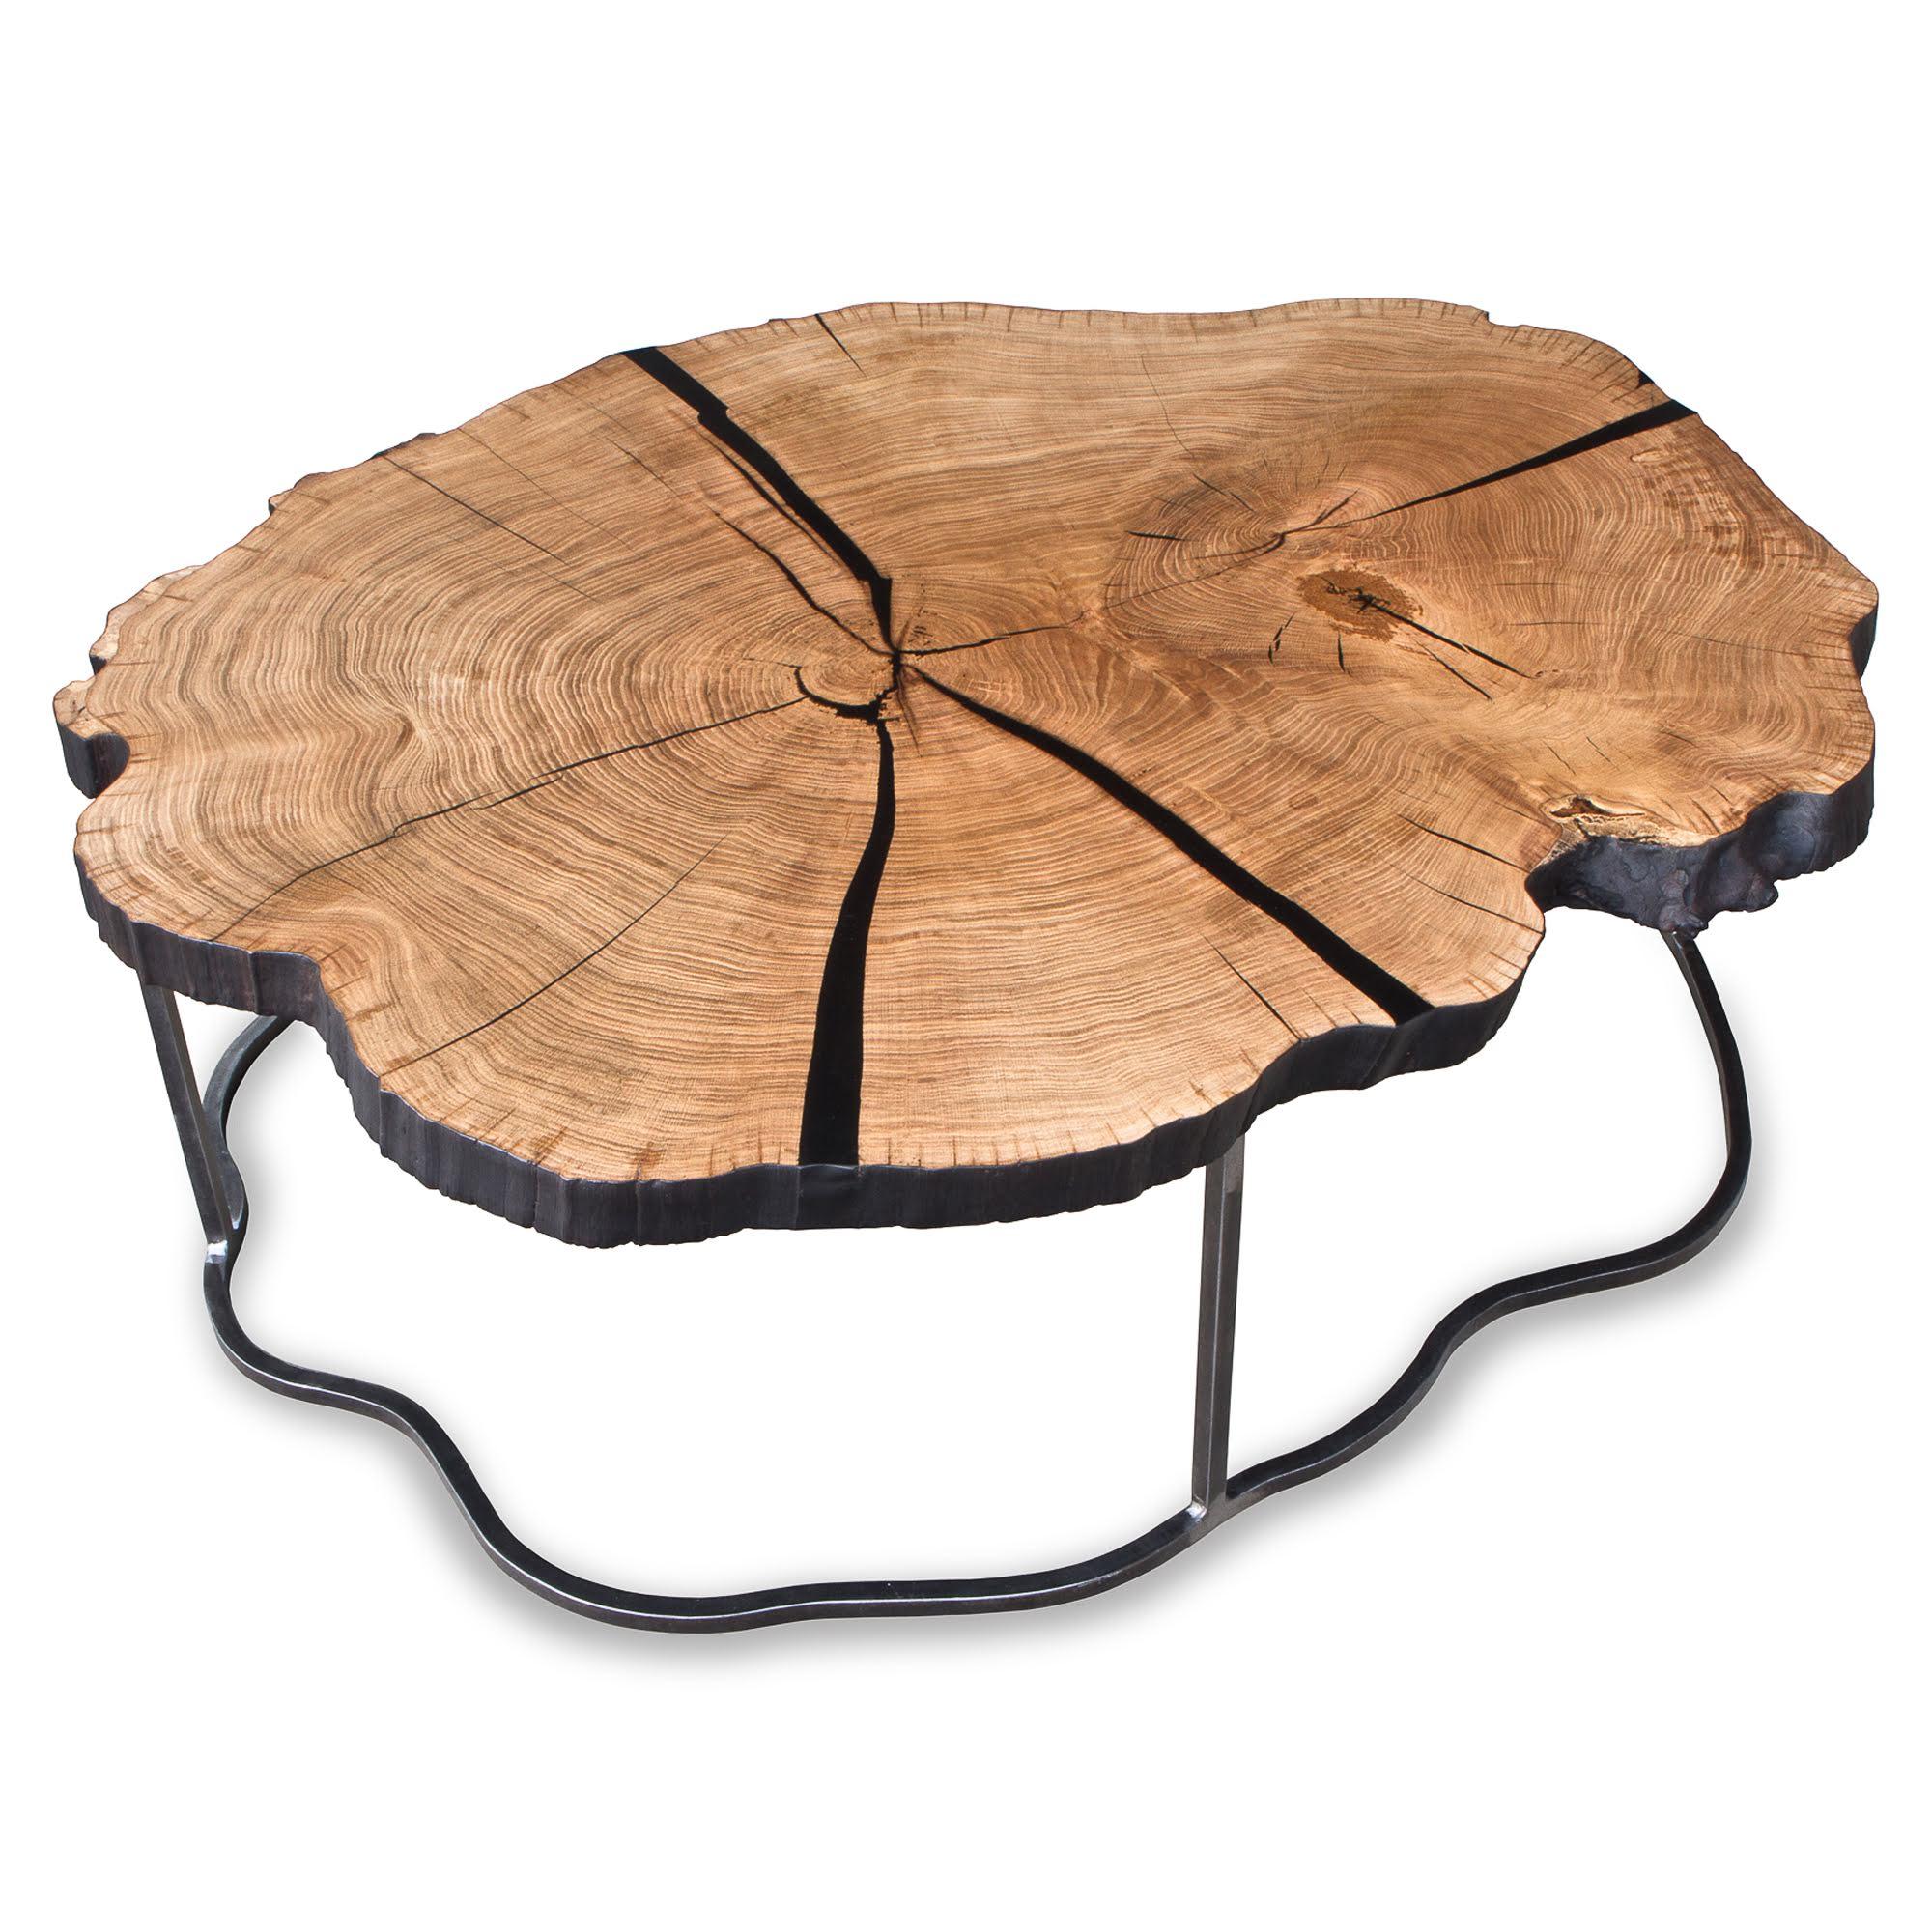 Prime Oak table Alex Brooks Furniture